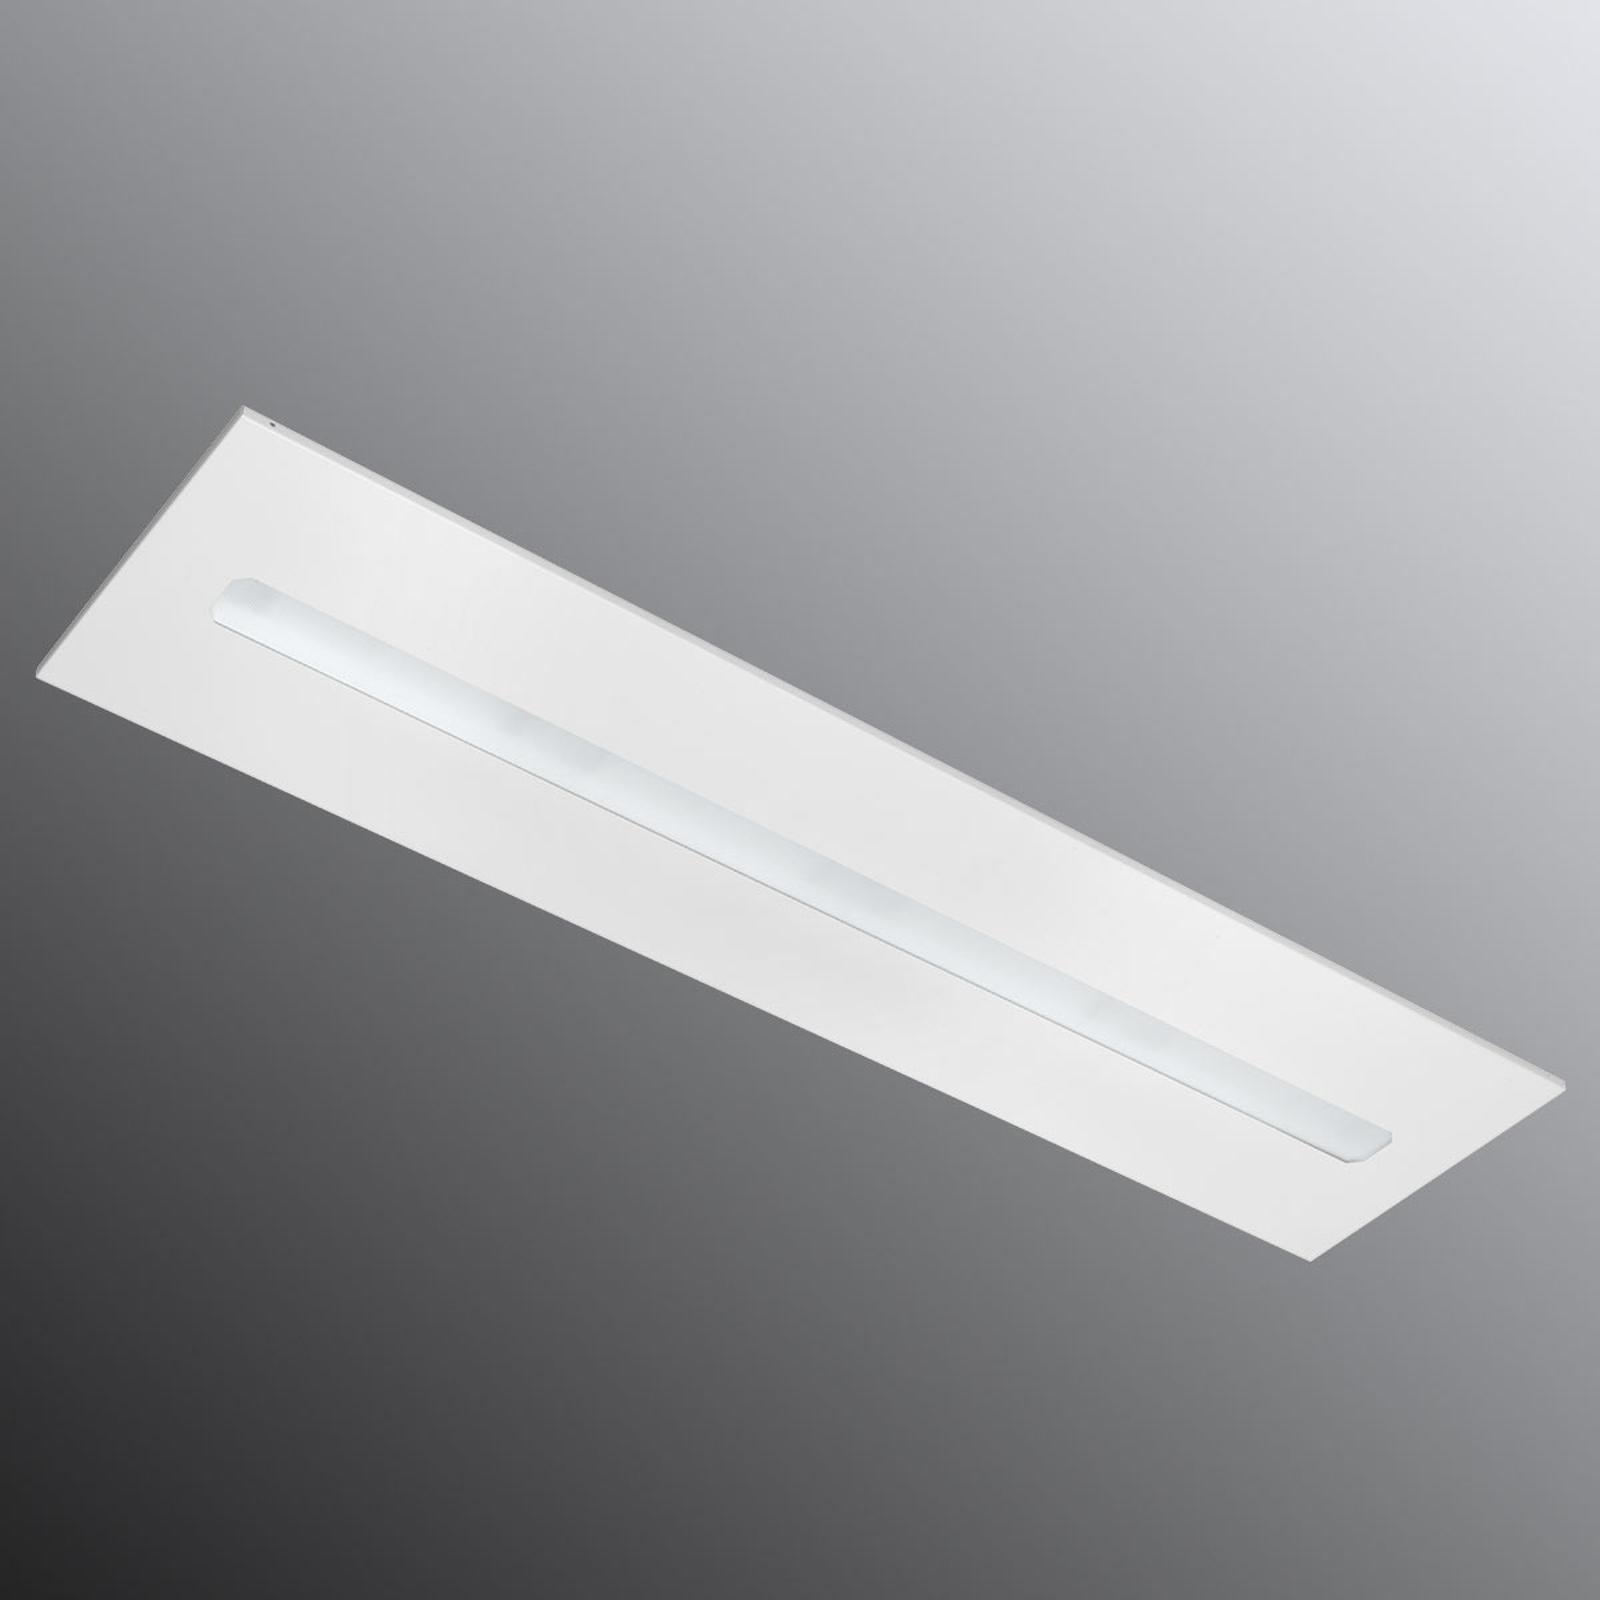 Freyn II Recessed LED-panel 124,5 x 31 cm 3000K